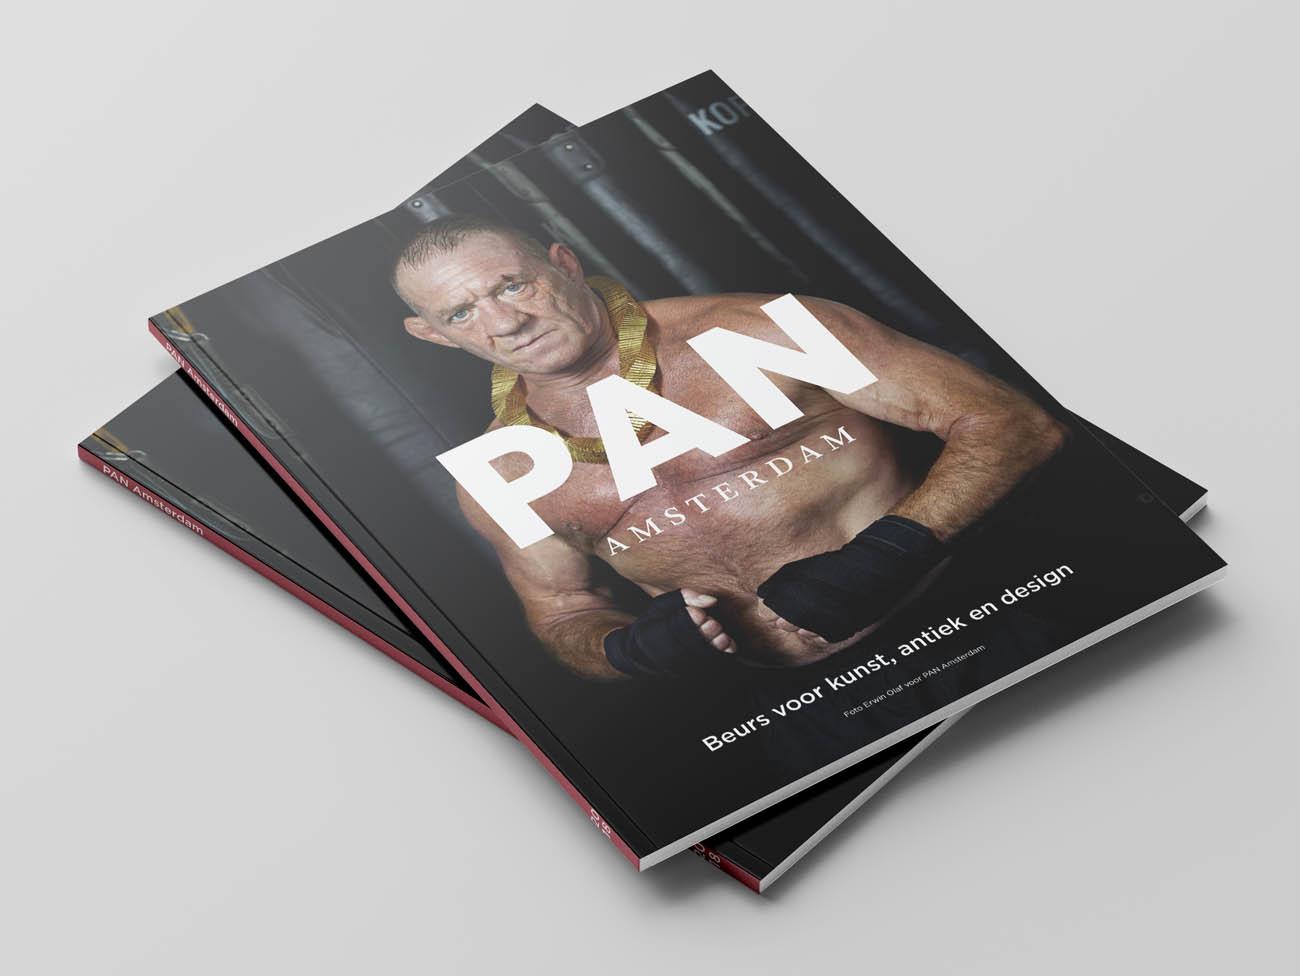 PAN Amsterdam, Amsterdam, 2018, beurs, kunst, art, fair, antiek, design, grafisch, ontwerp, grafisch ontwerp, graphic design, campagne, erwin olaf, fotografie, folder, pan podium, podium, flyer, editoriaal, erwin olaf, magazine, editoriaal